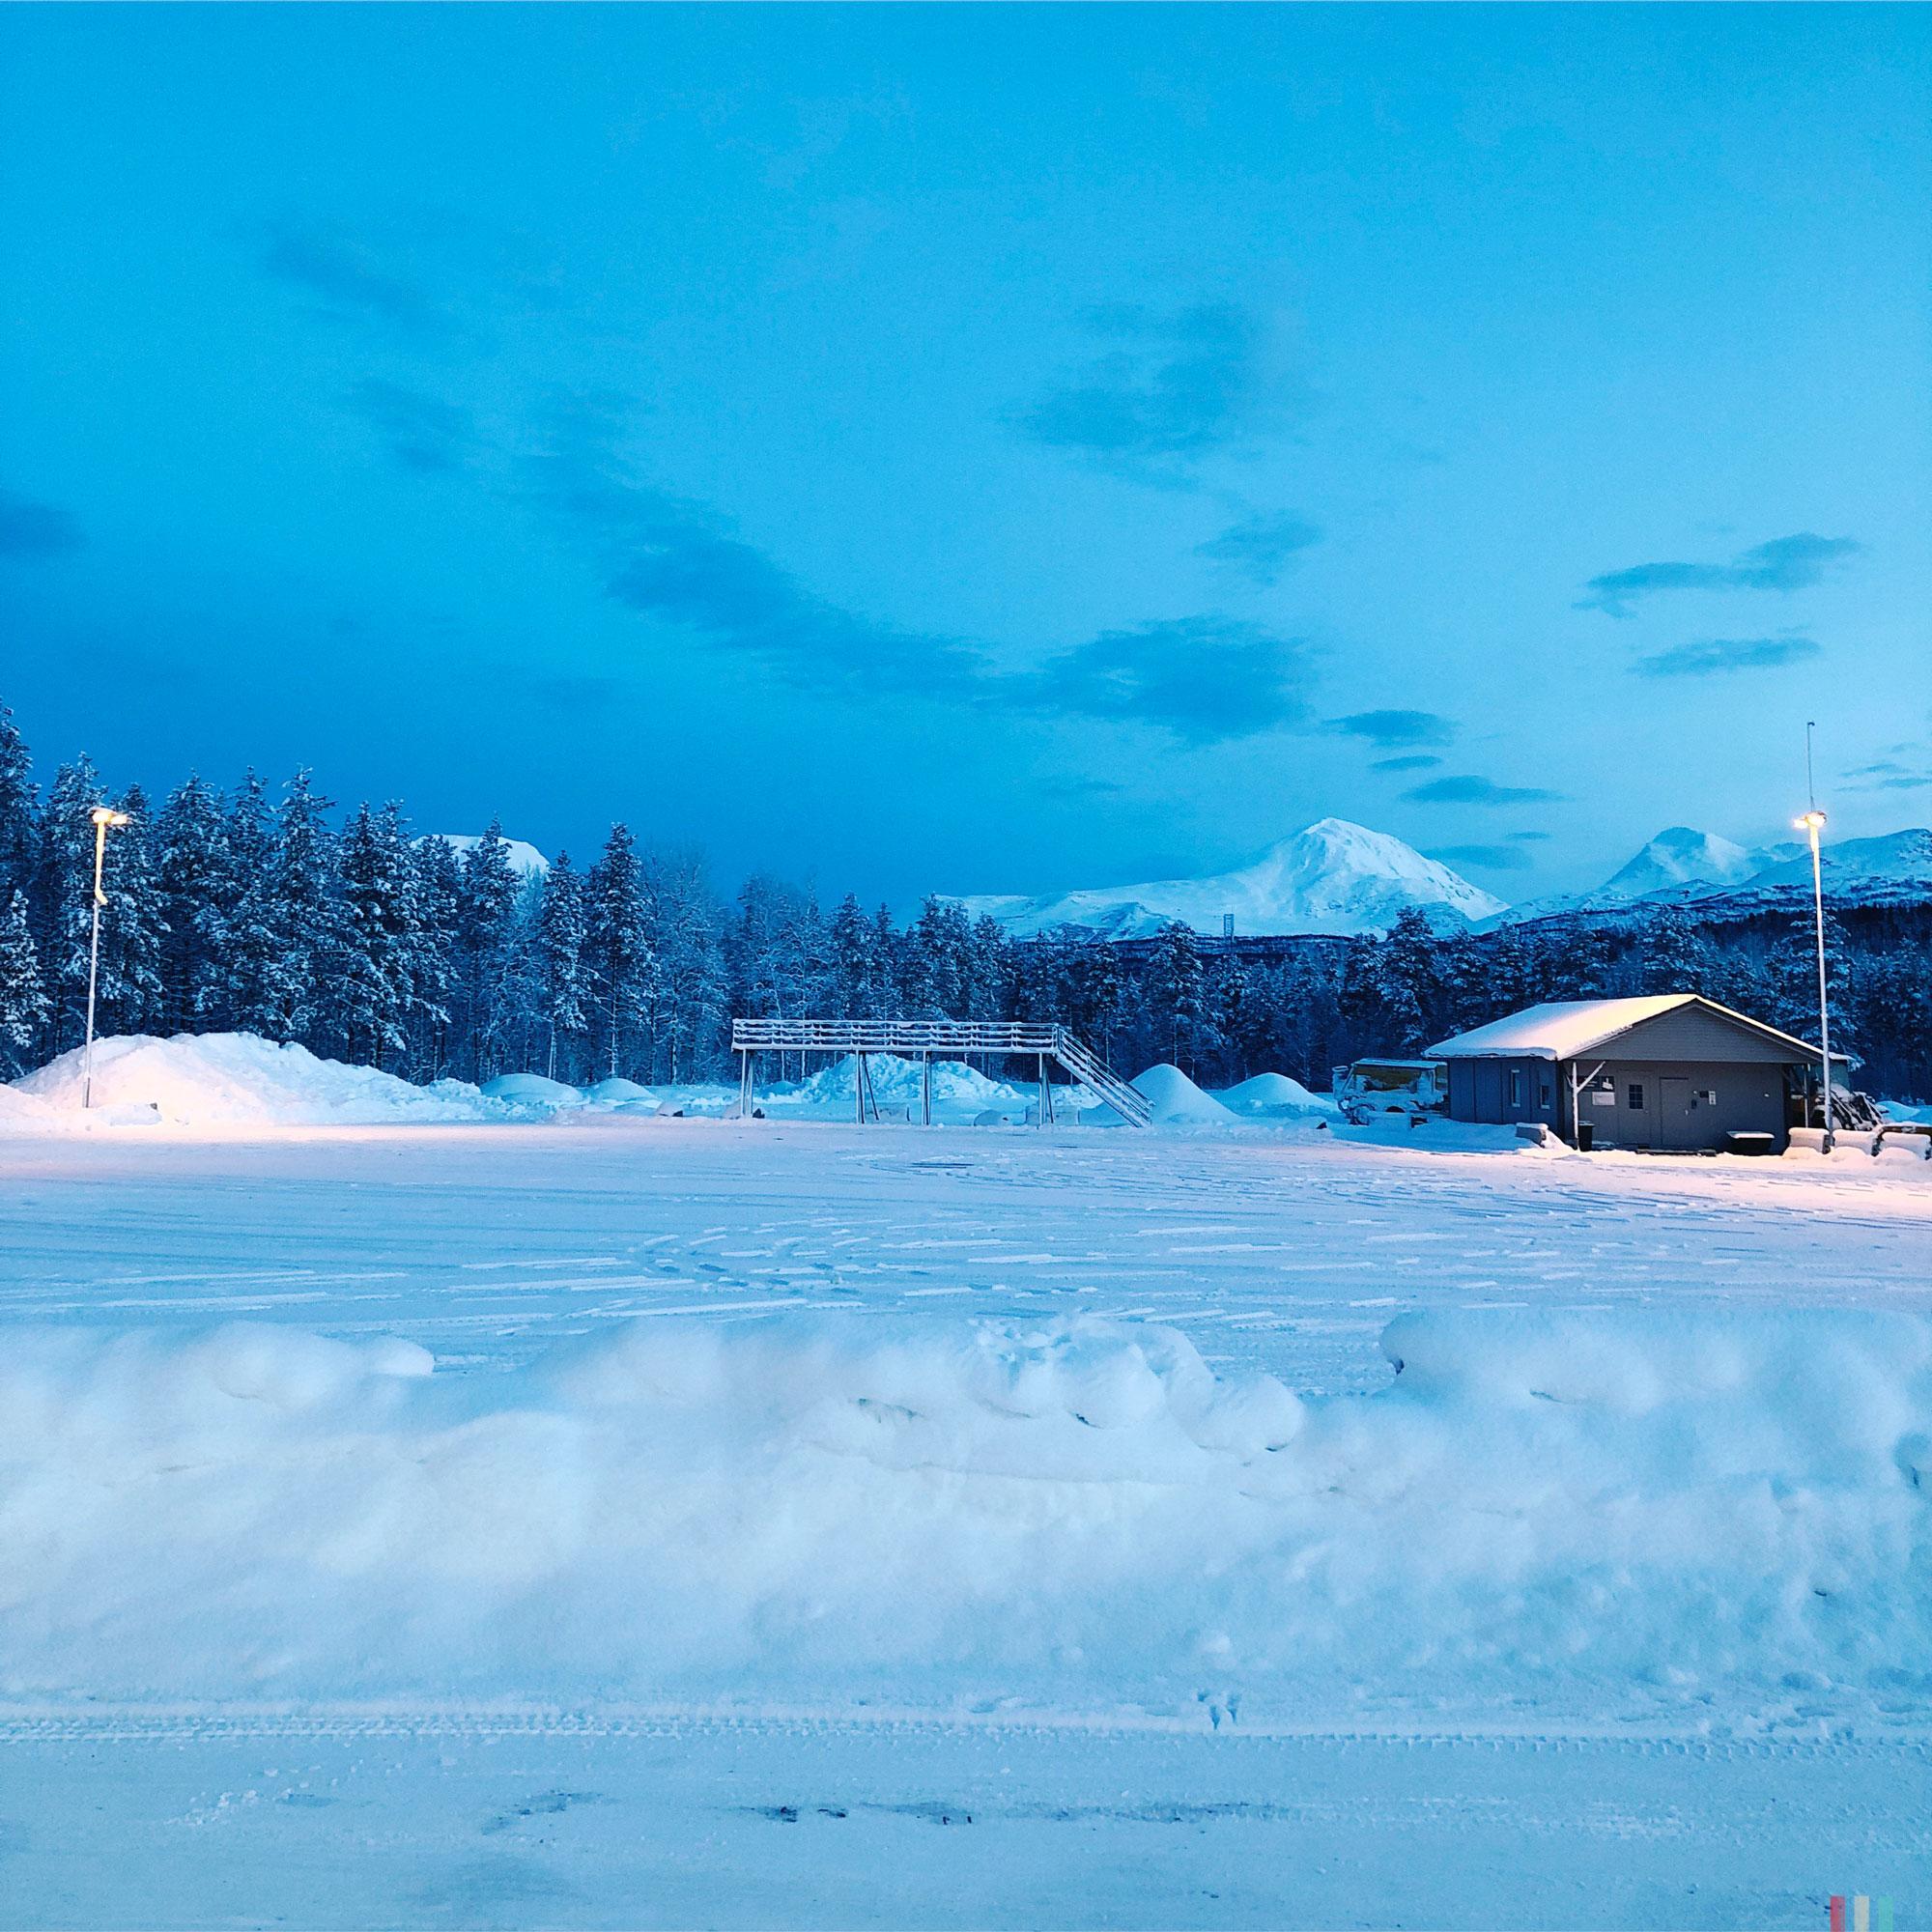 norwegen-tromso-road-trip-13-uhr.jpg